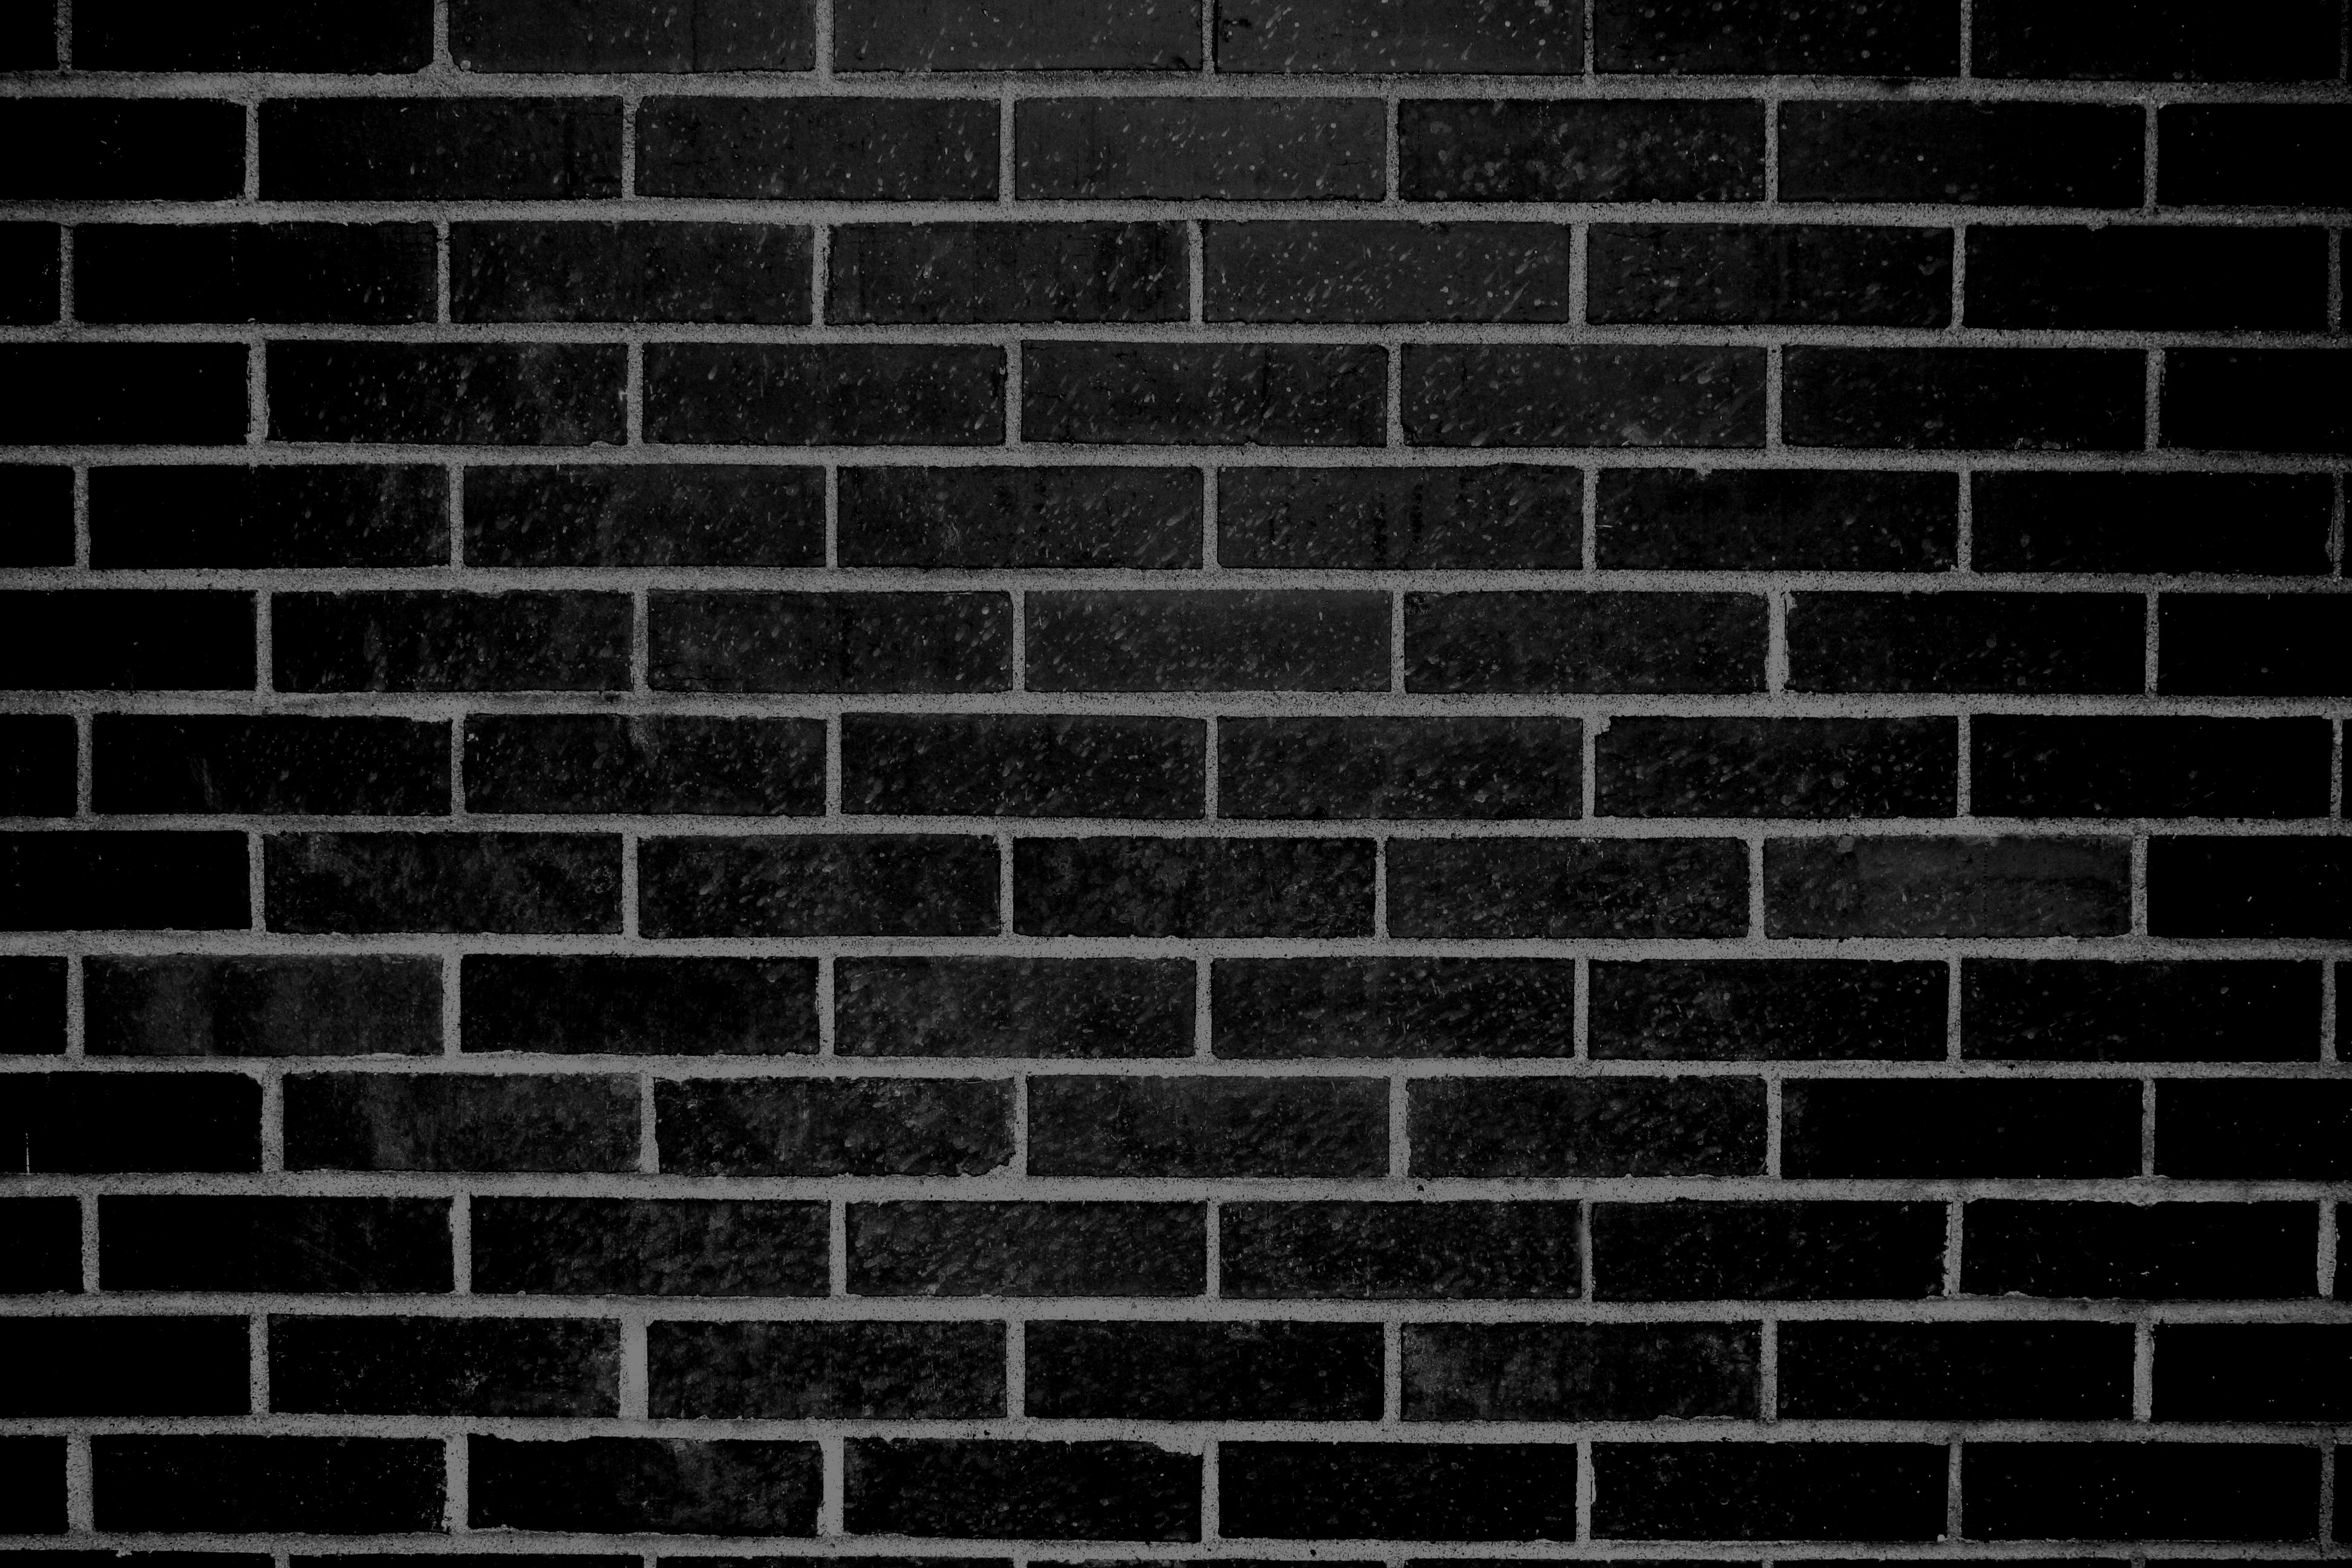 Black Brick Wall Texture Picture | Free Photograph | Photos Public ...